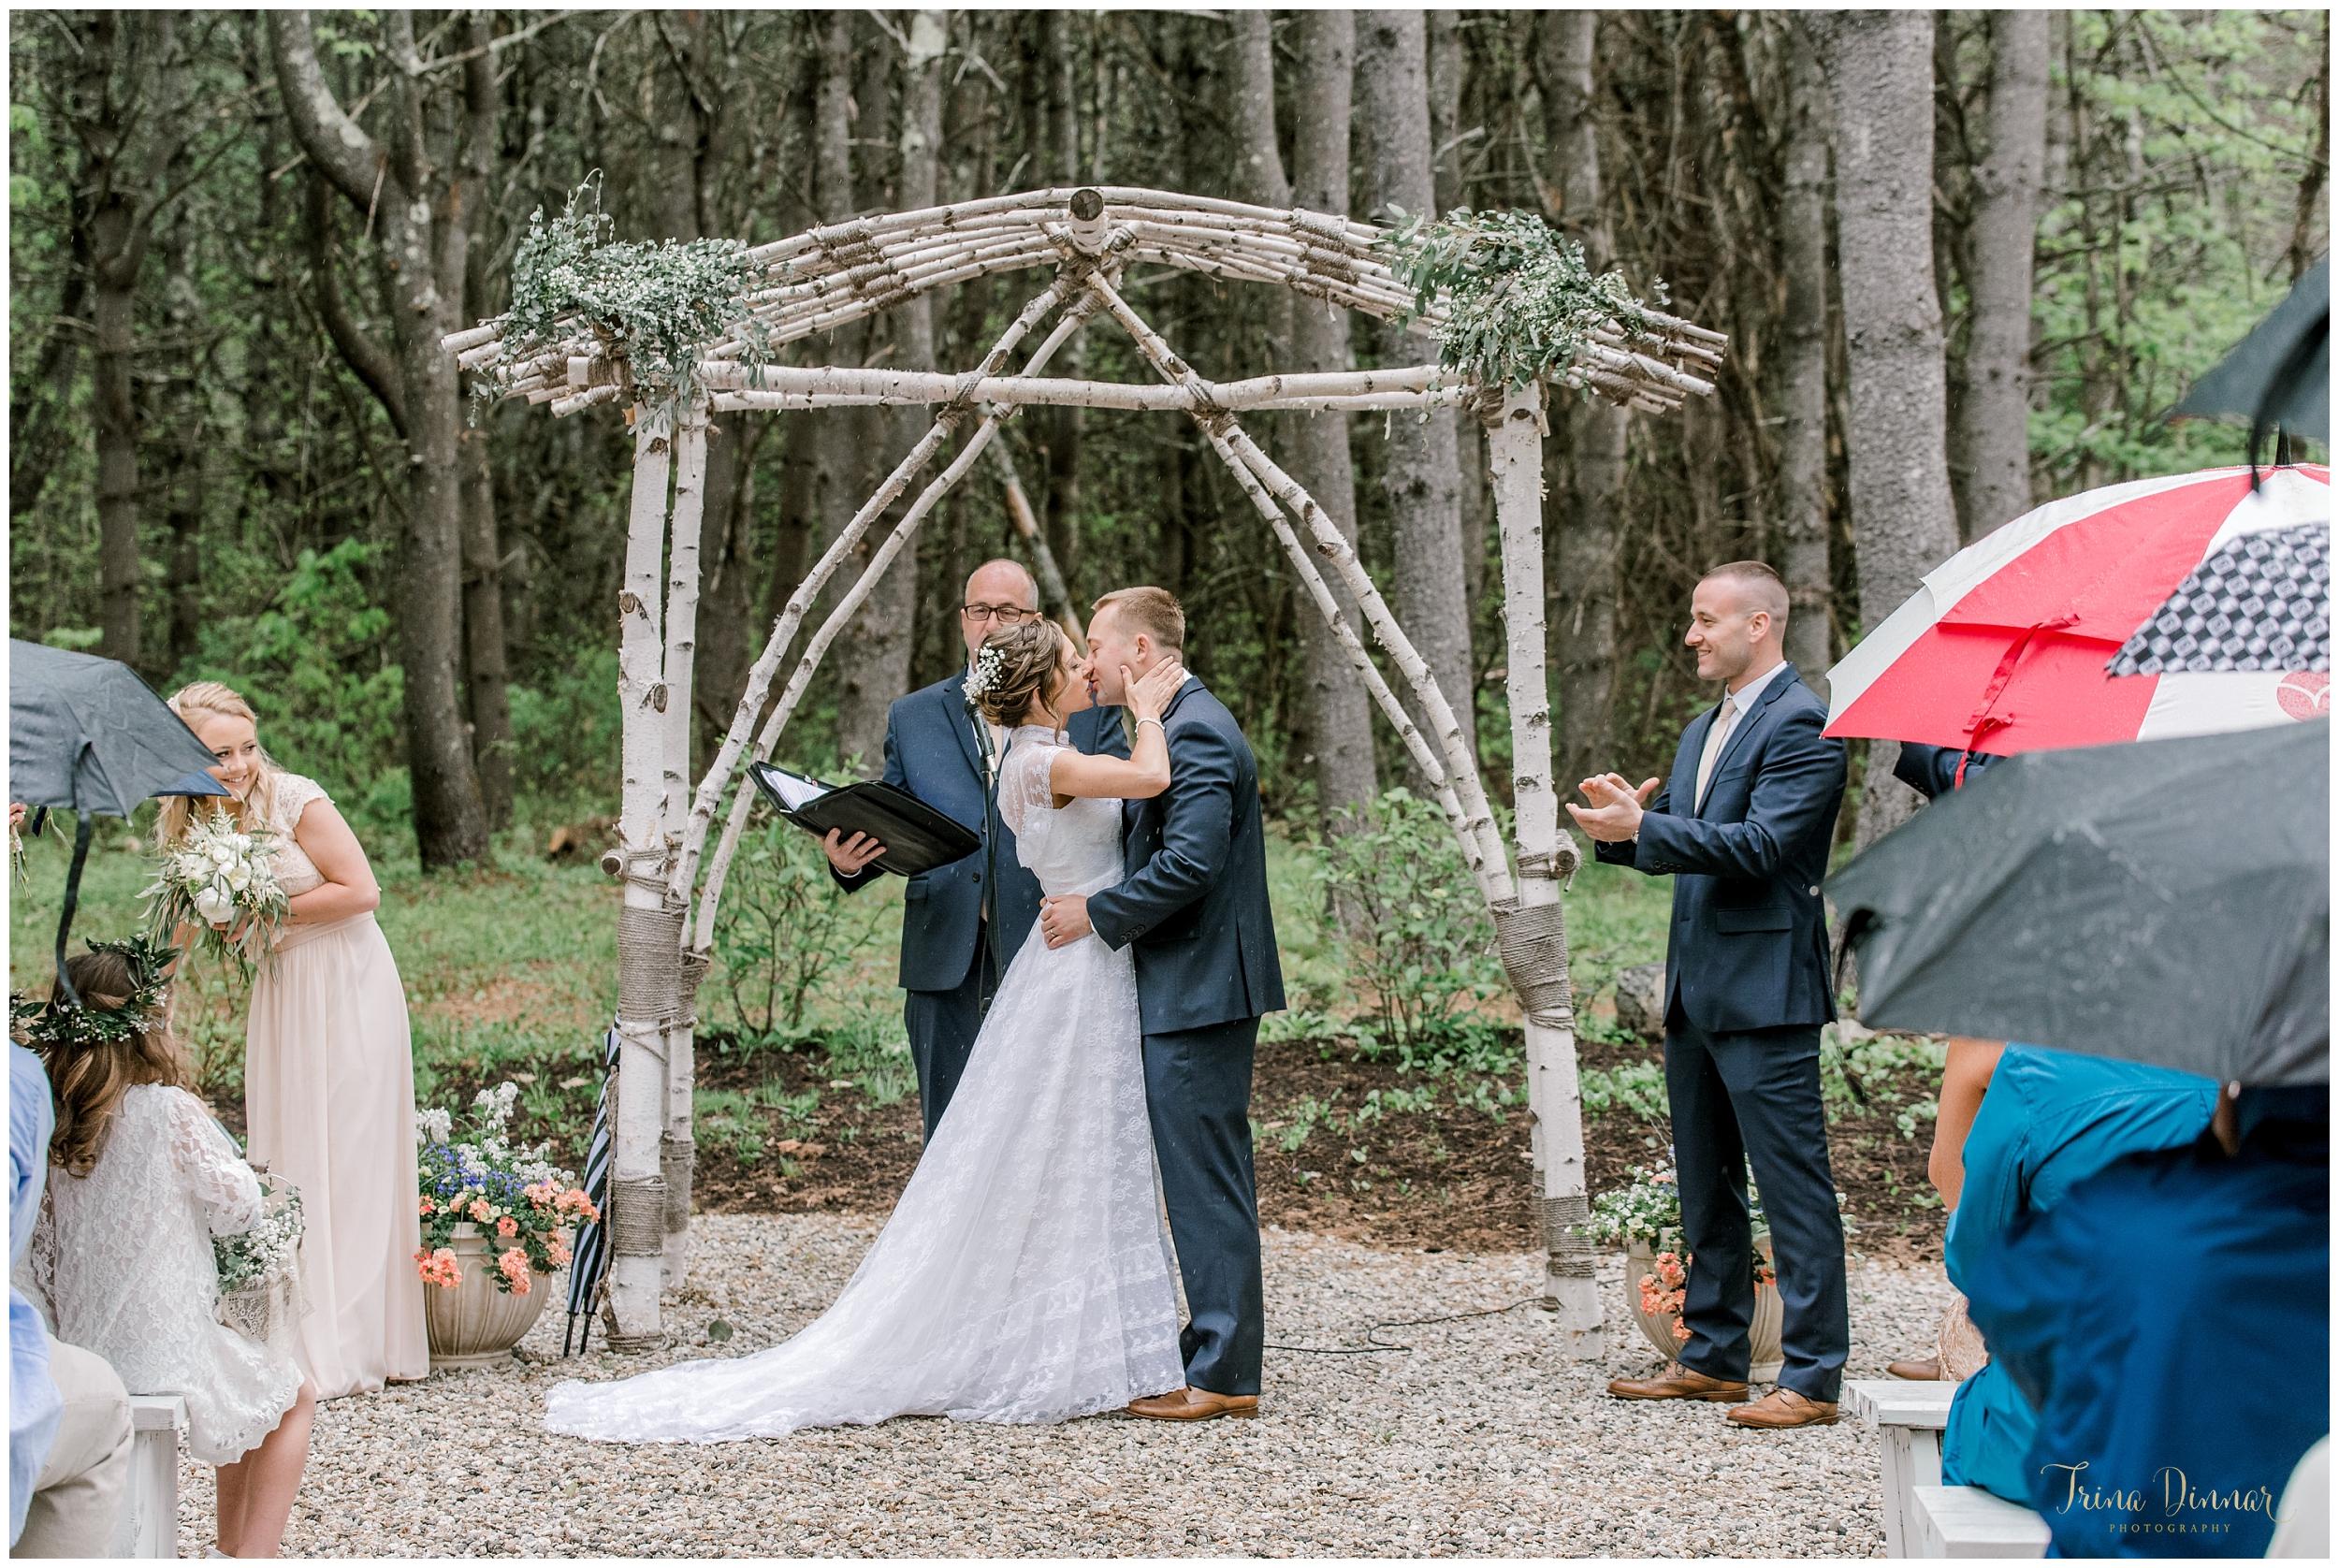 The Barn at Flanagan Farm Wedding by Trina Dinnar Photography.